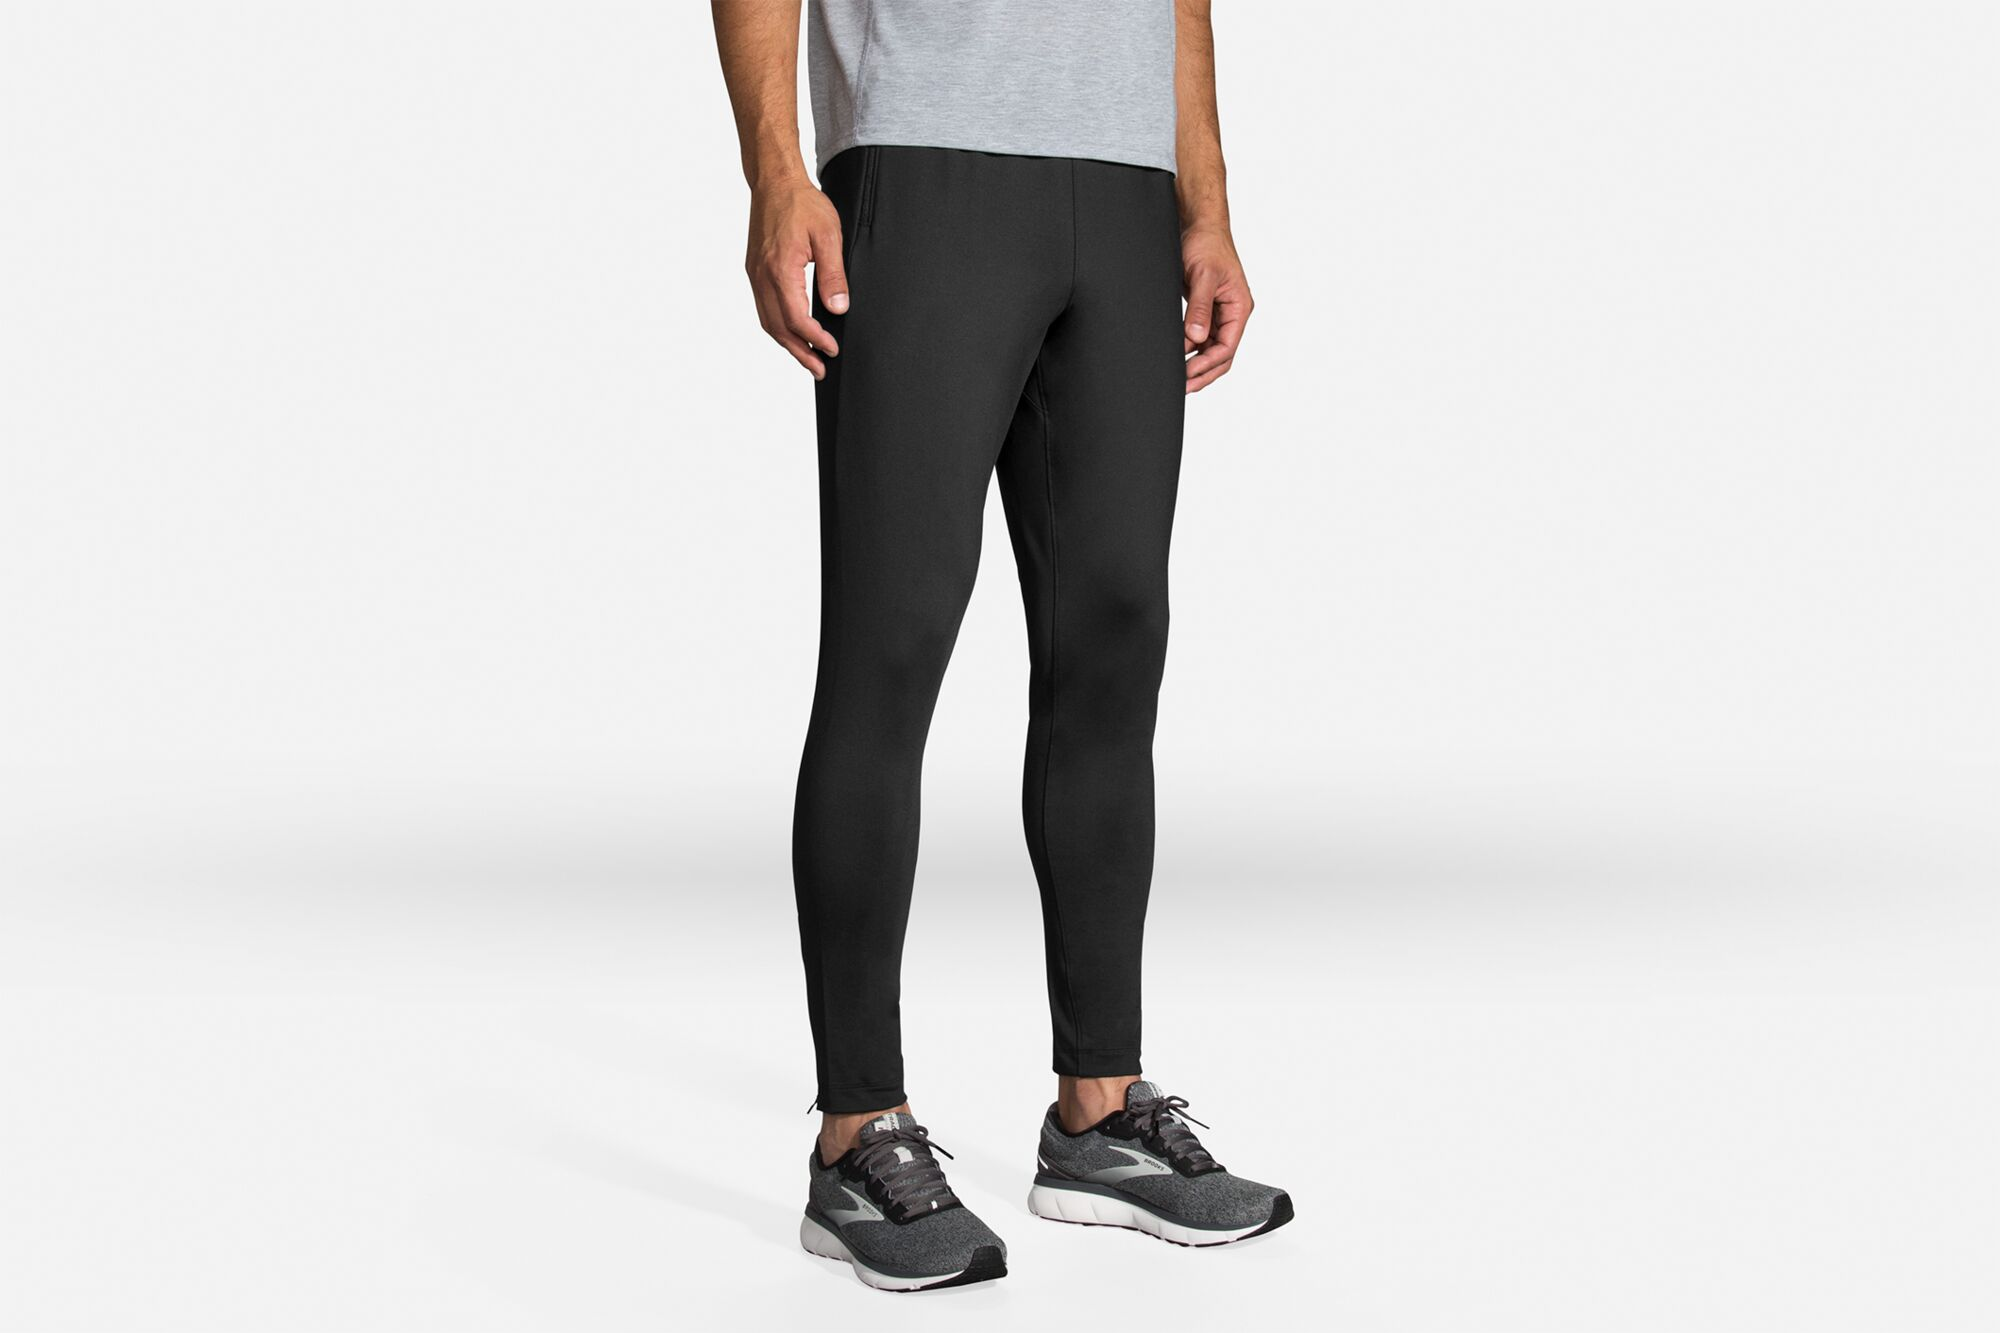 Brooks Spartan Pant (Black)